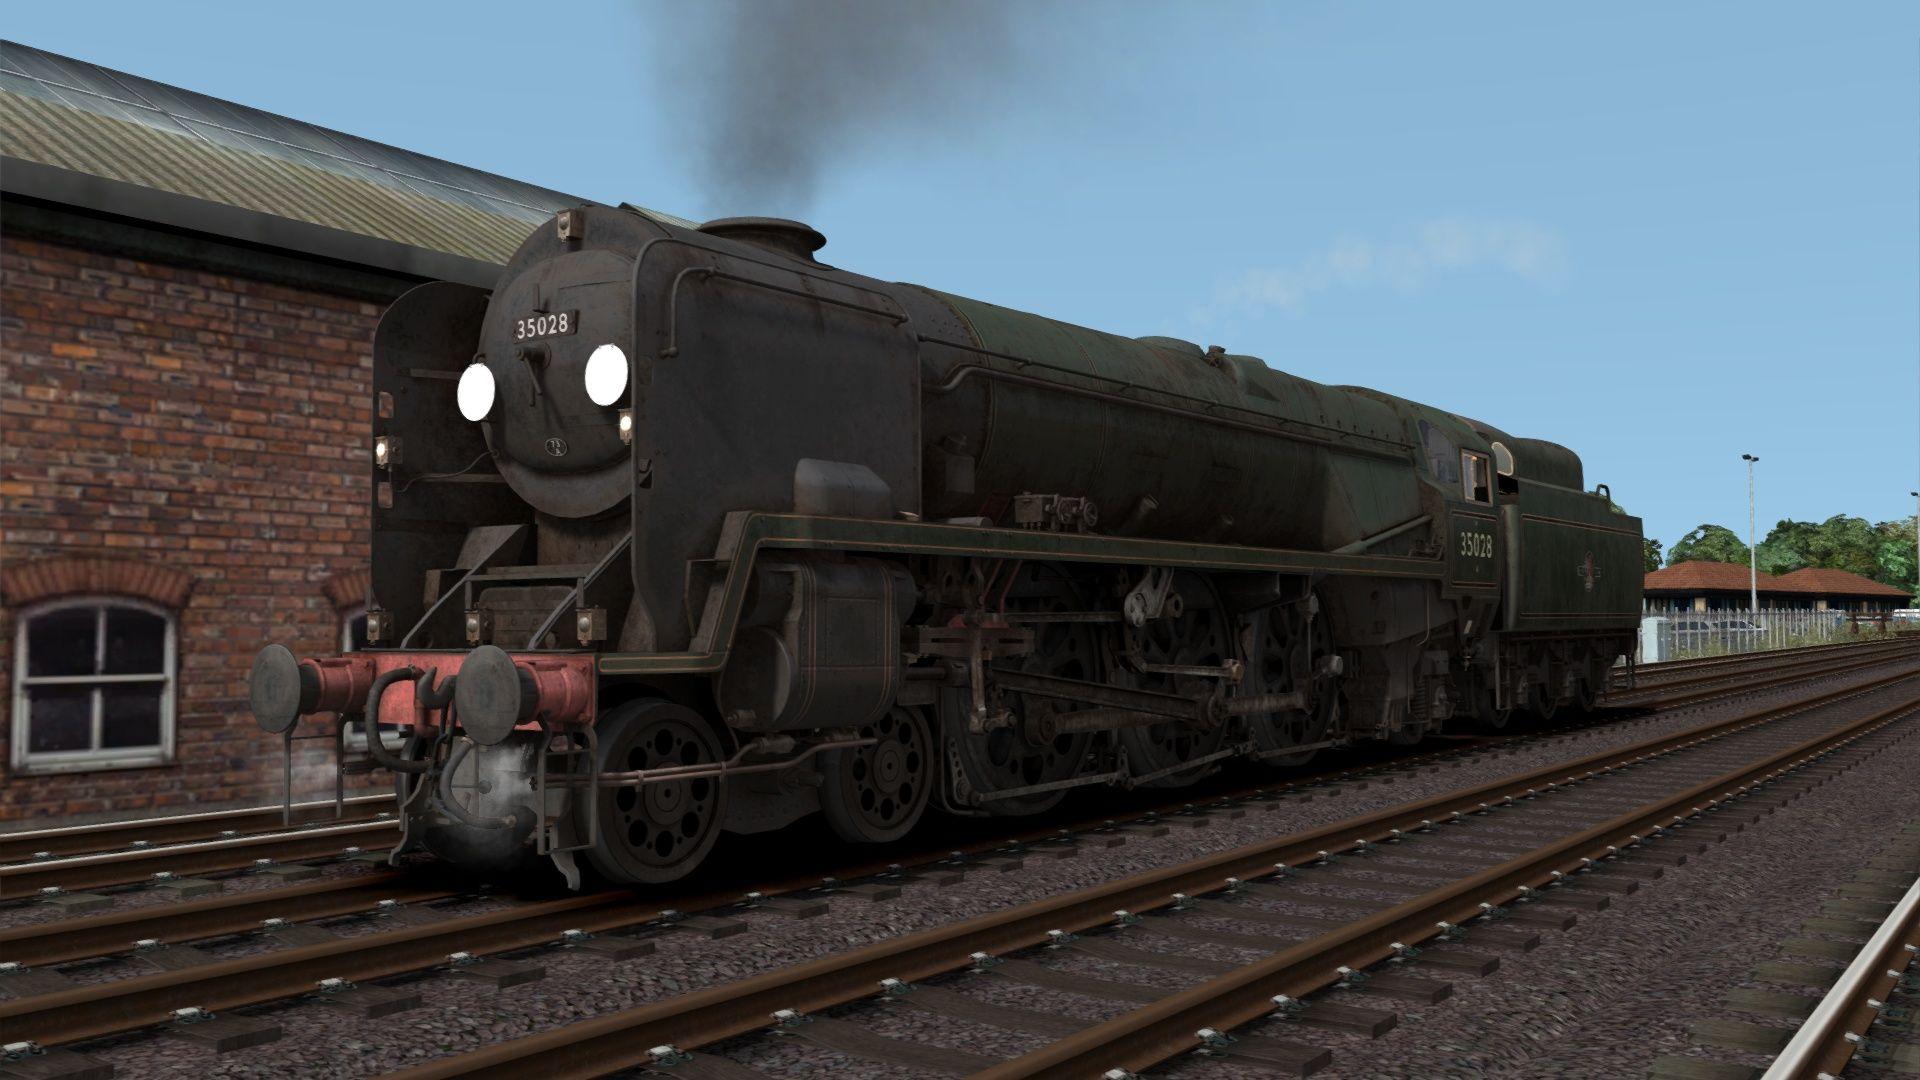 Screenshot_Welsh Marches Line - Newport to Shrewsbury_52.06255--2.71073_09-00-50.jpg